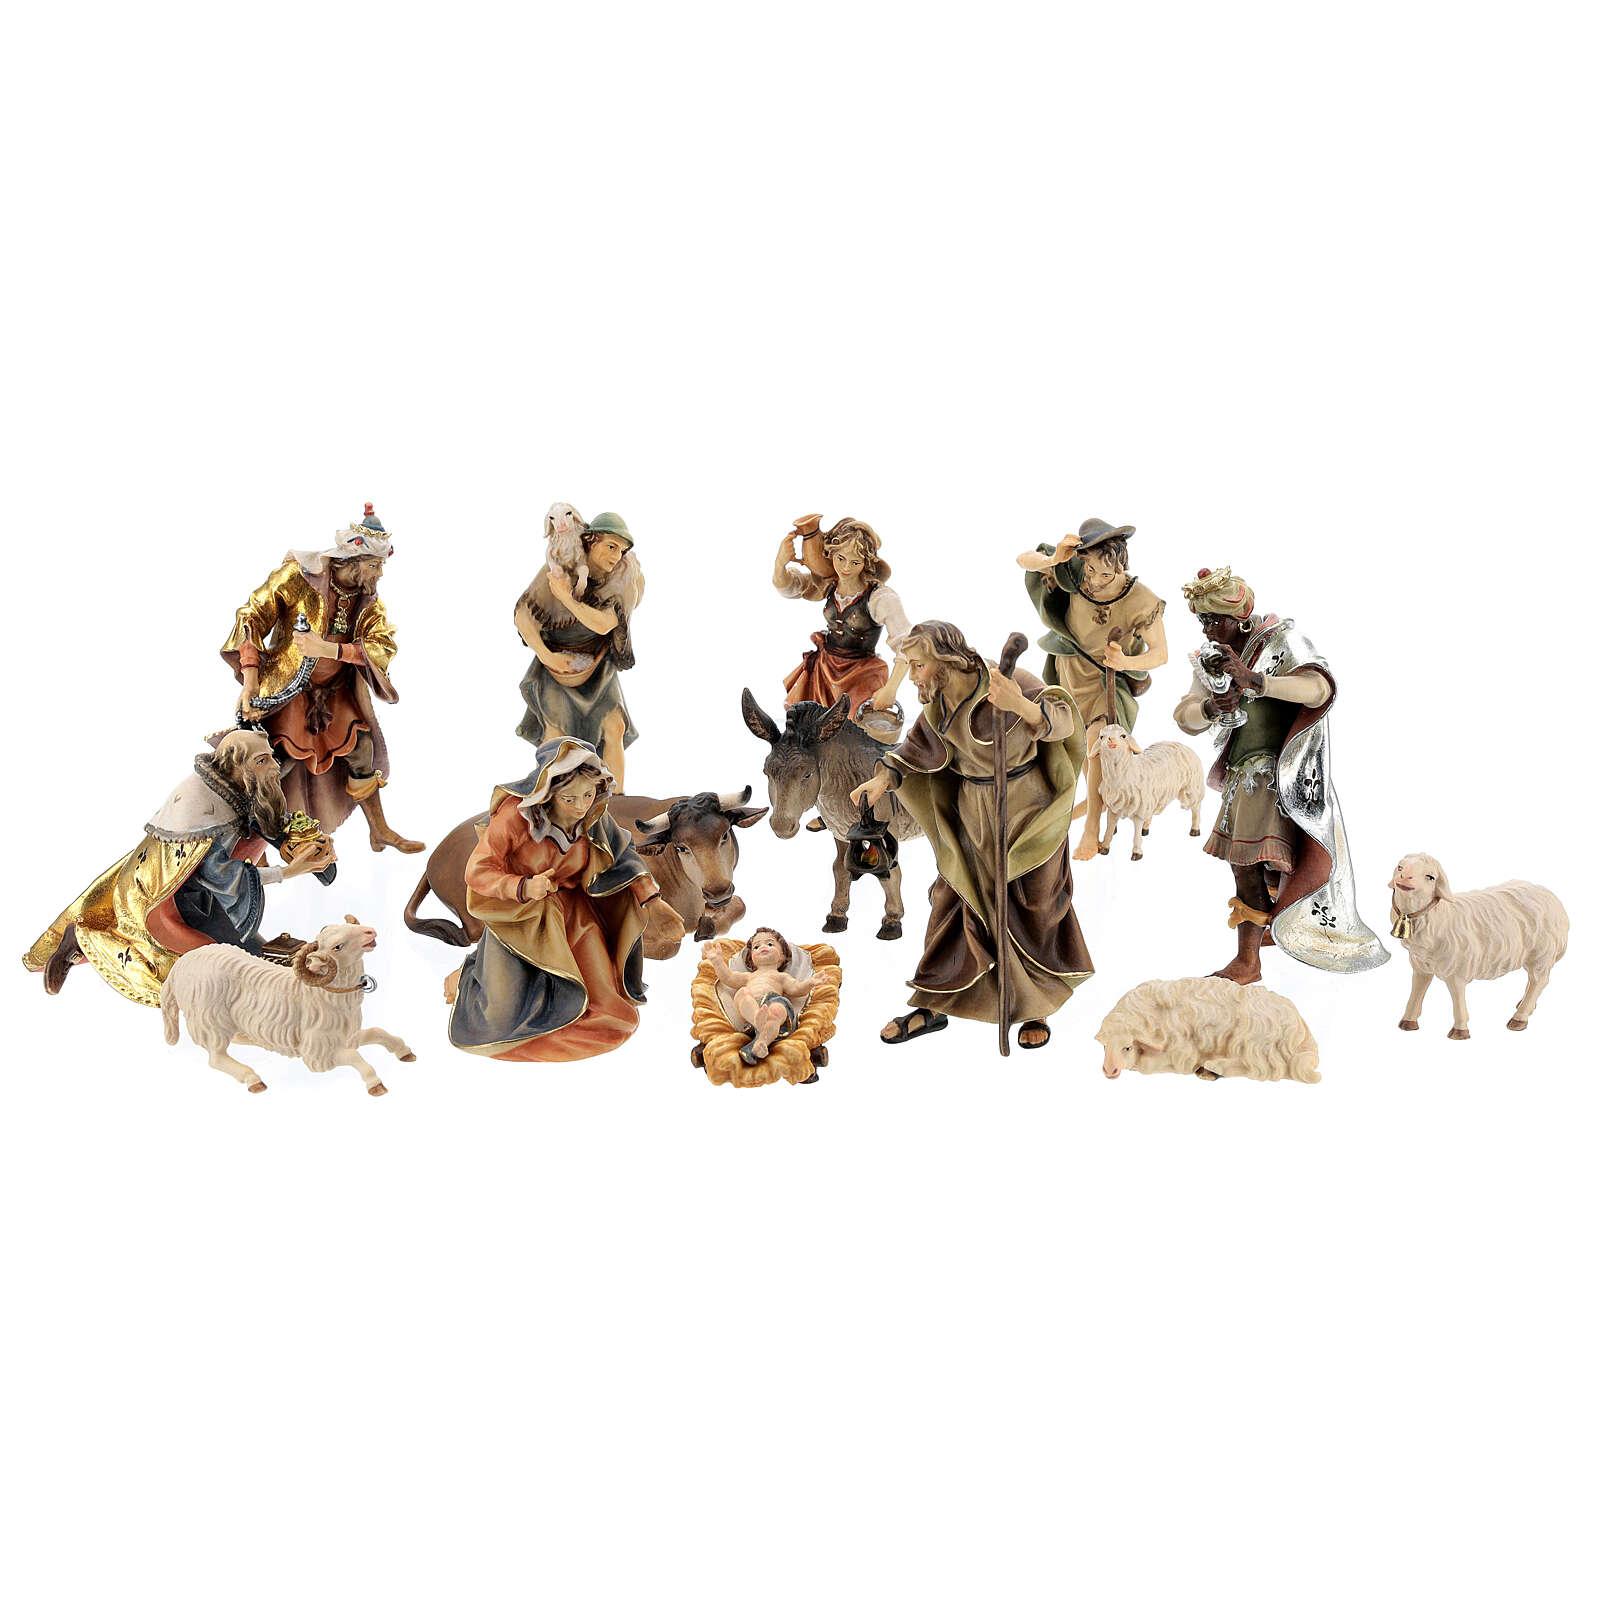 Crèche Original Ulrich set 14 figurines 12 cm bois Val Gardena